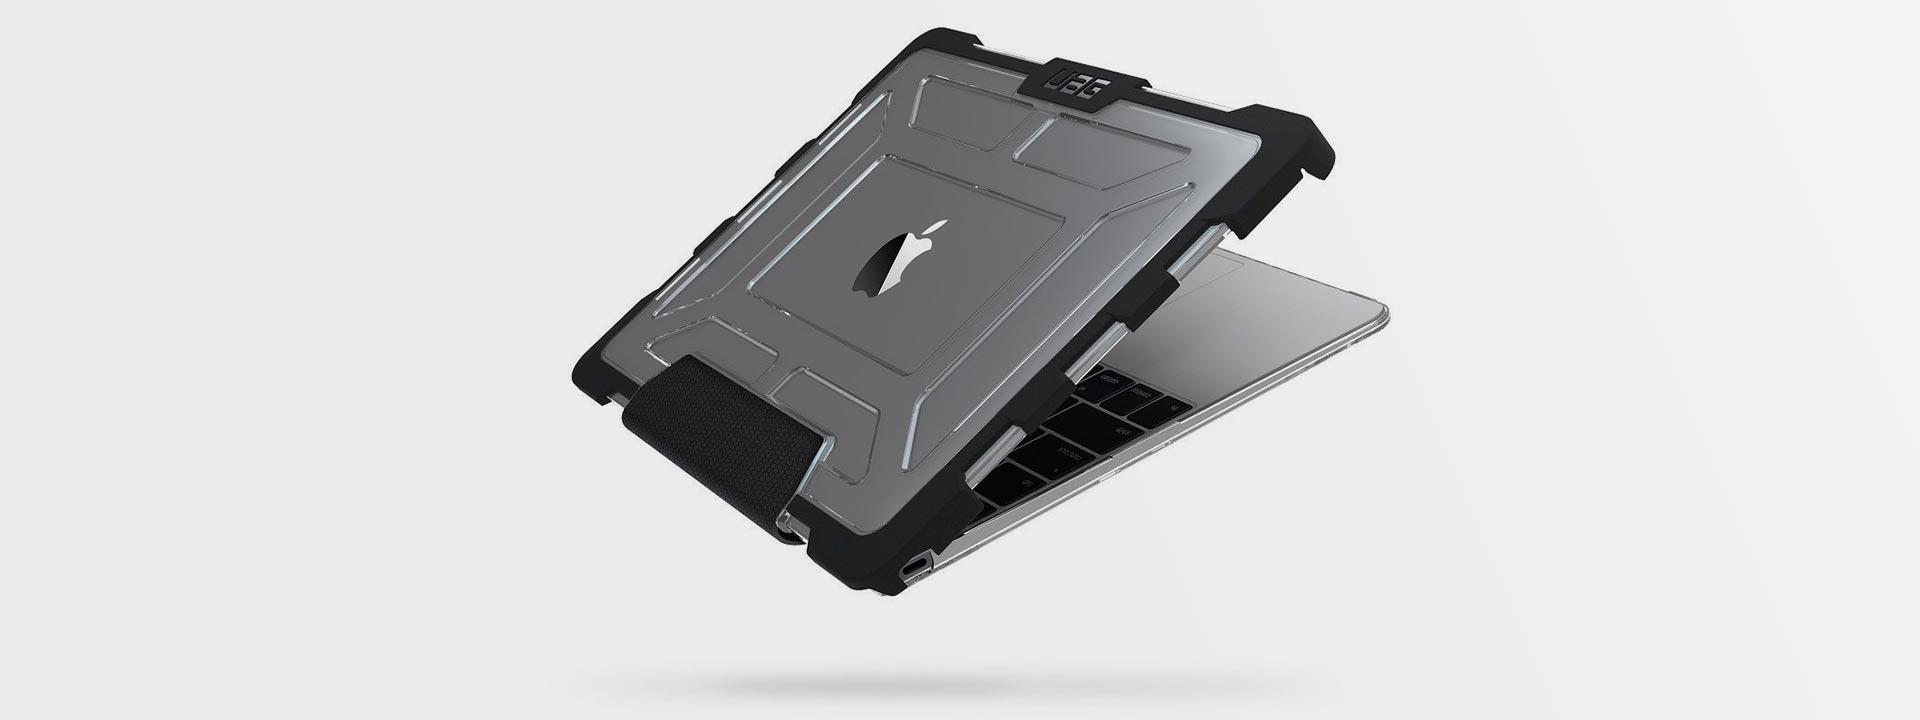 Чехол Armor Shell для Macbook